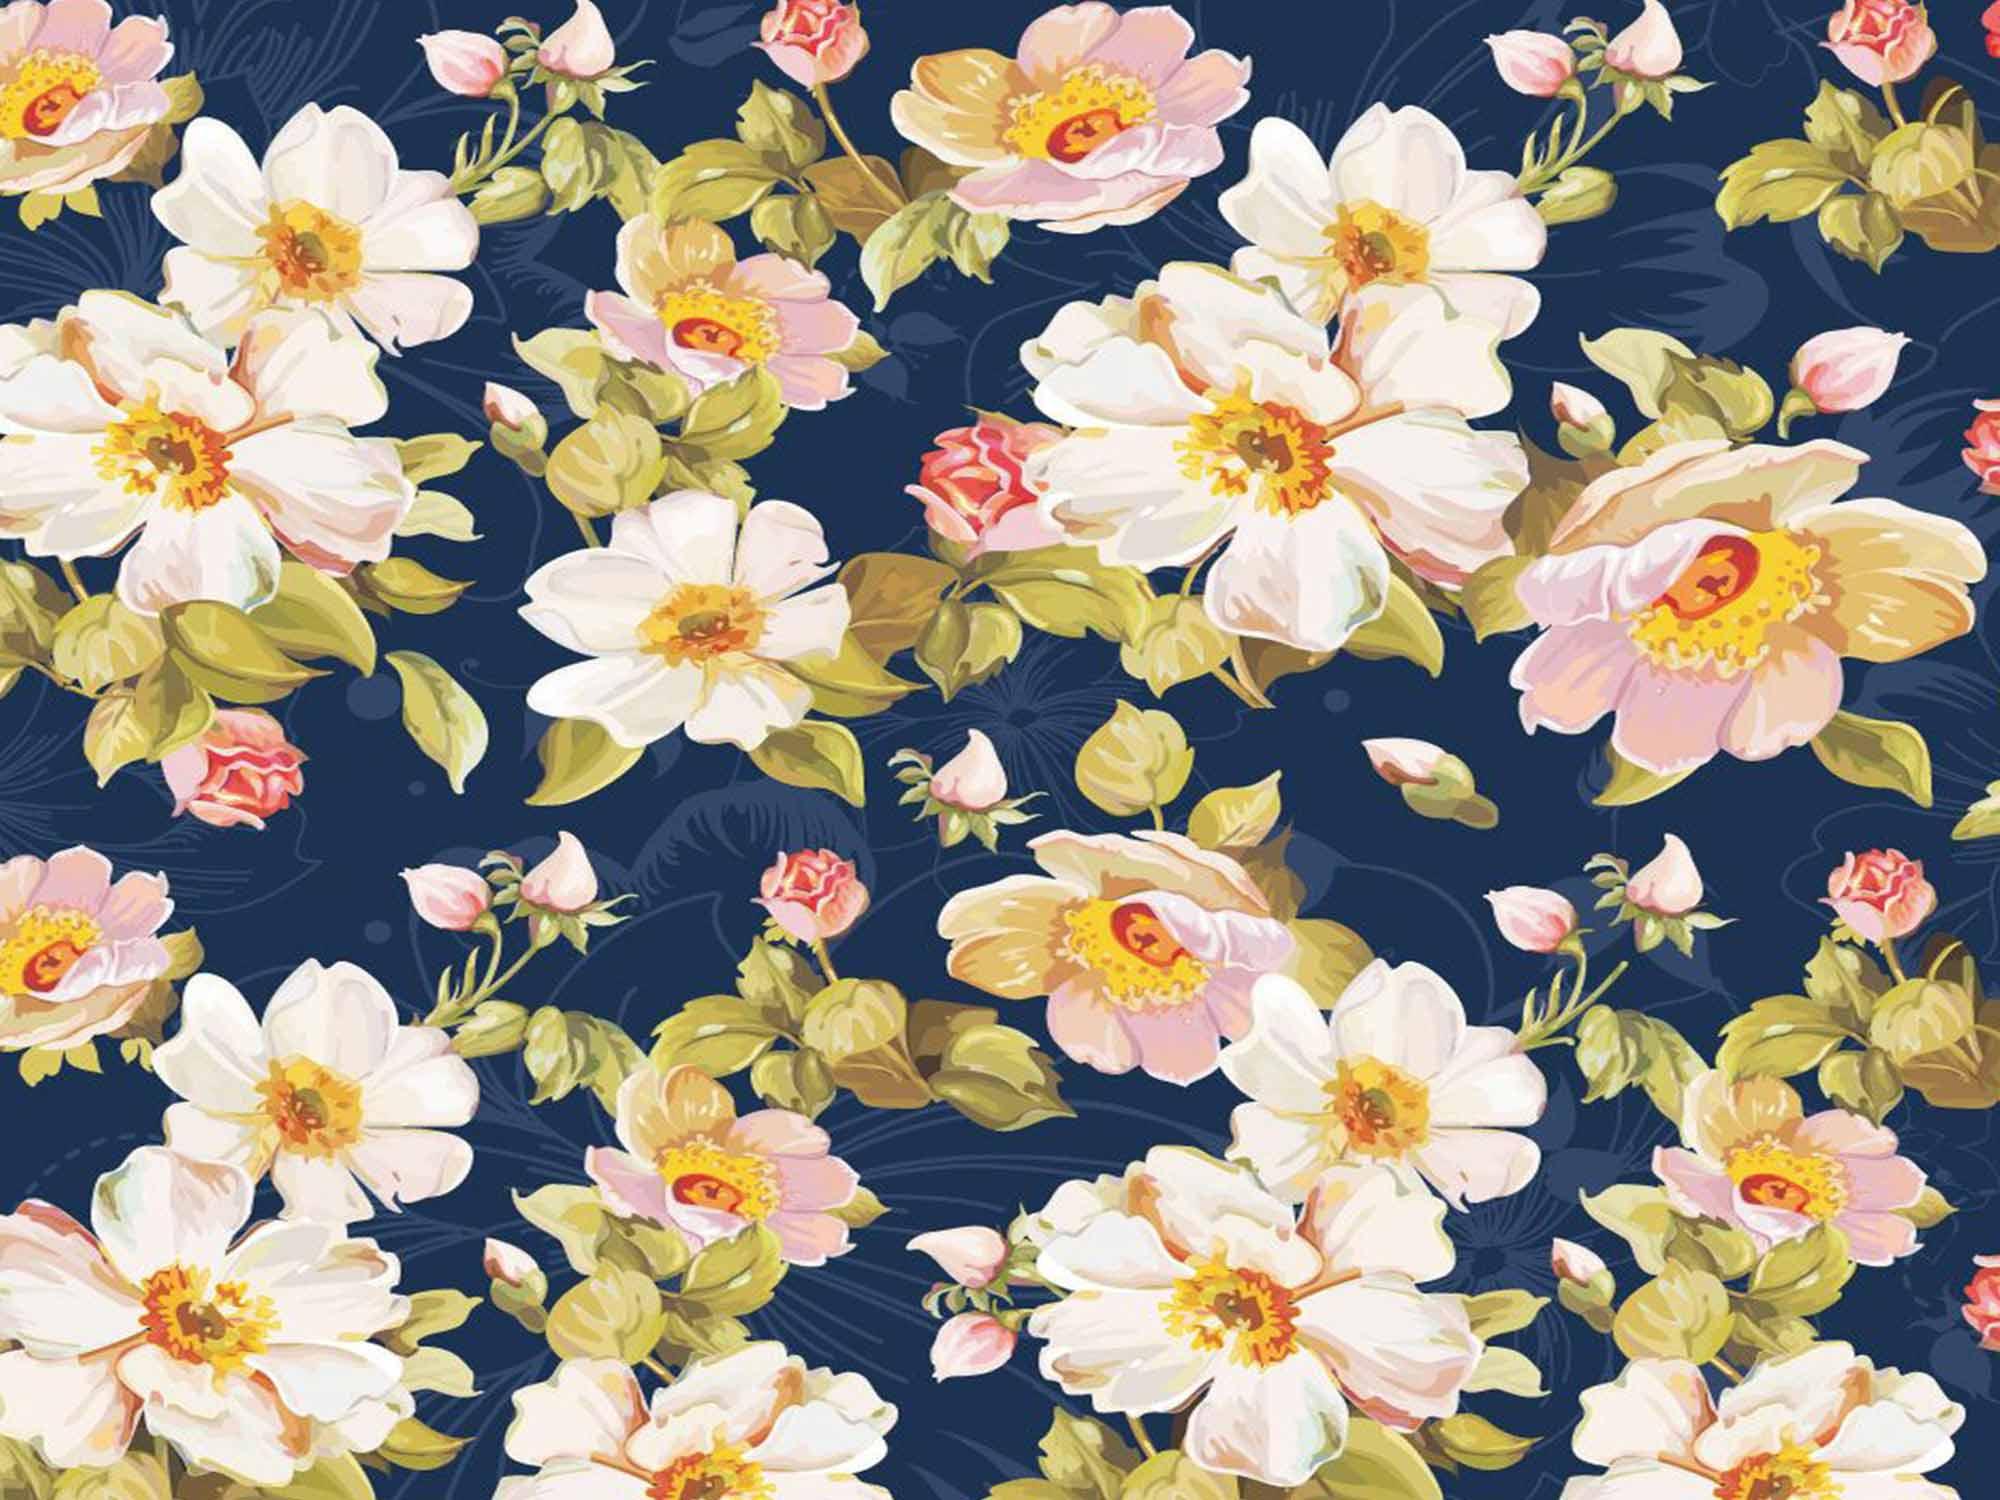 Papel de Parede Floral 0088 - Adesivos de Parede  - Paredes Decoradas